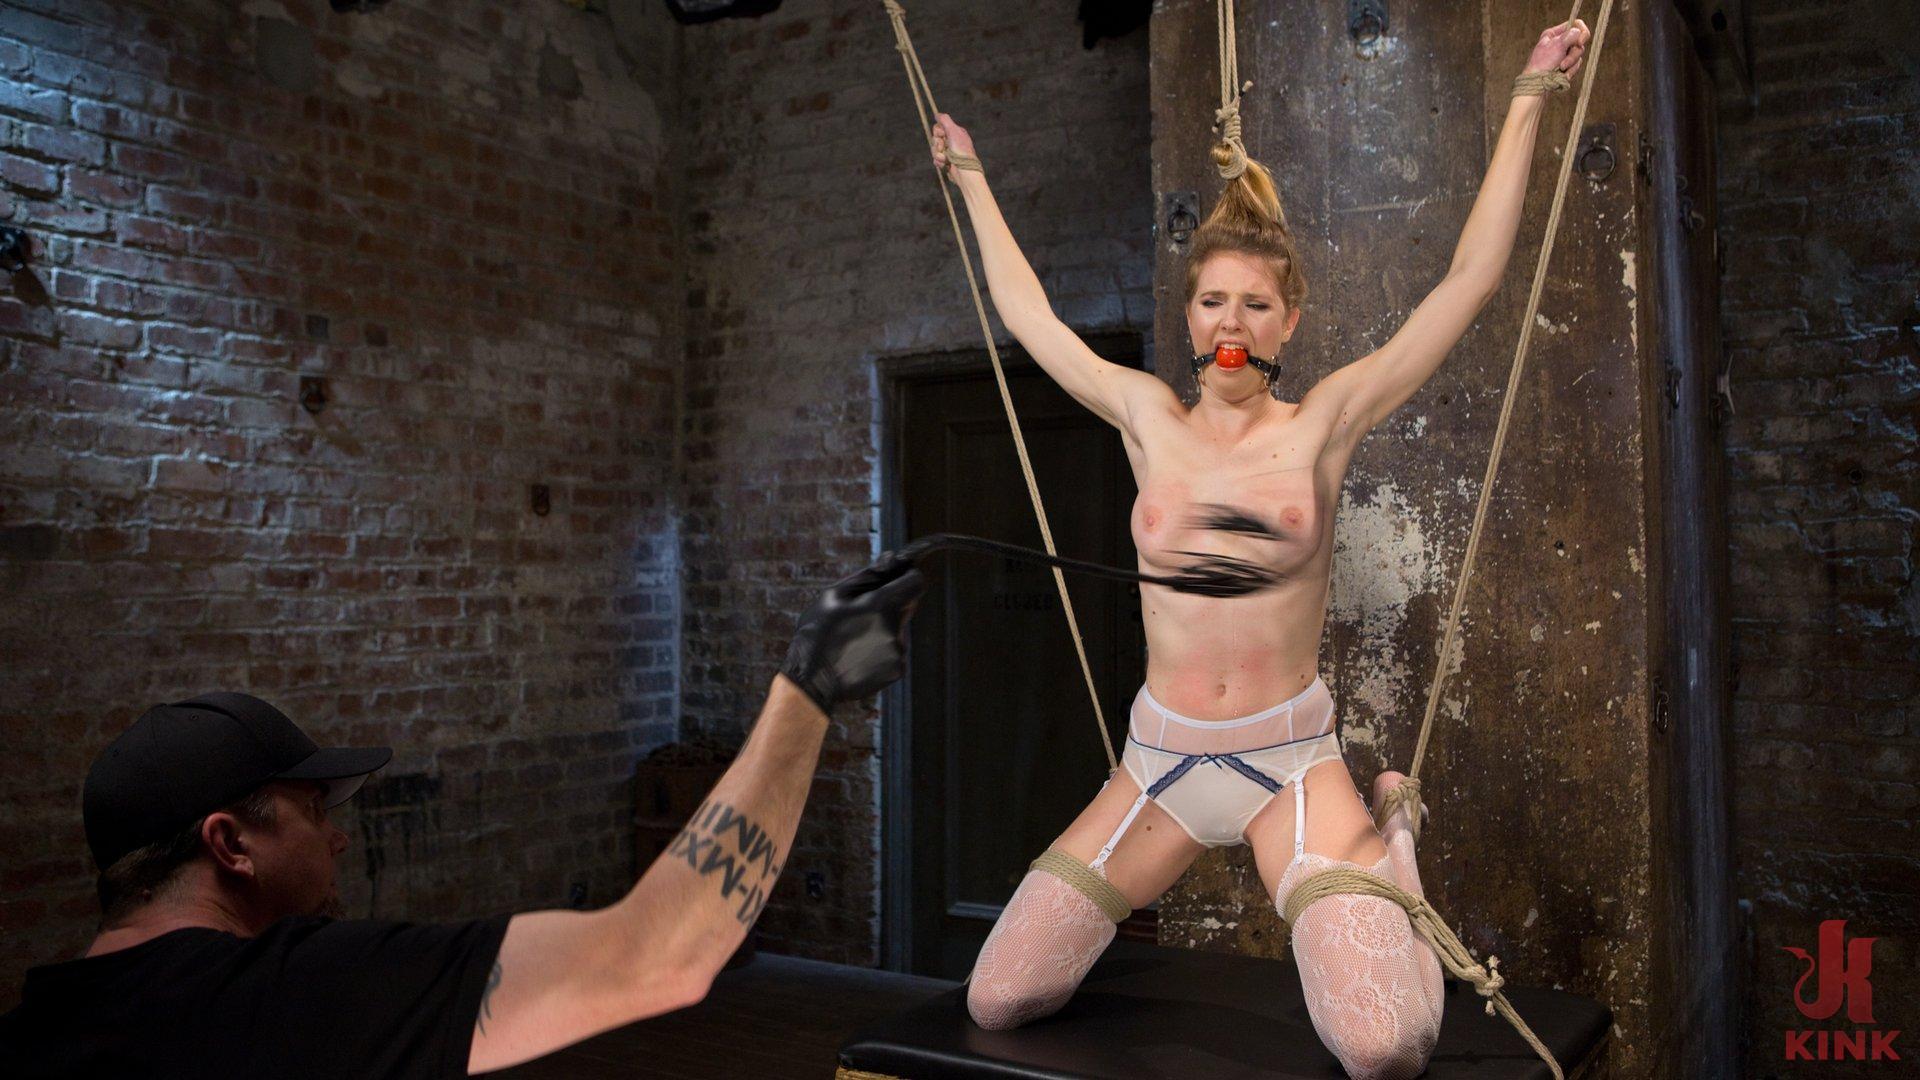 Bondage, caning, flogging, predicament bondage, pussy fucking, extreme suspension, orgasm denial, corporal punishment